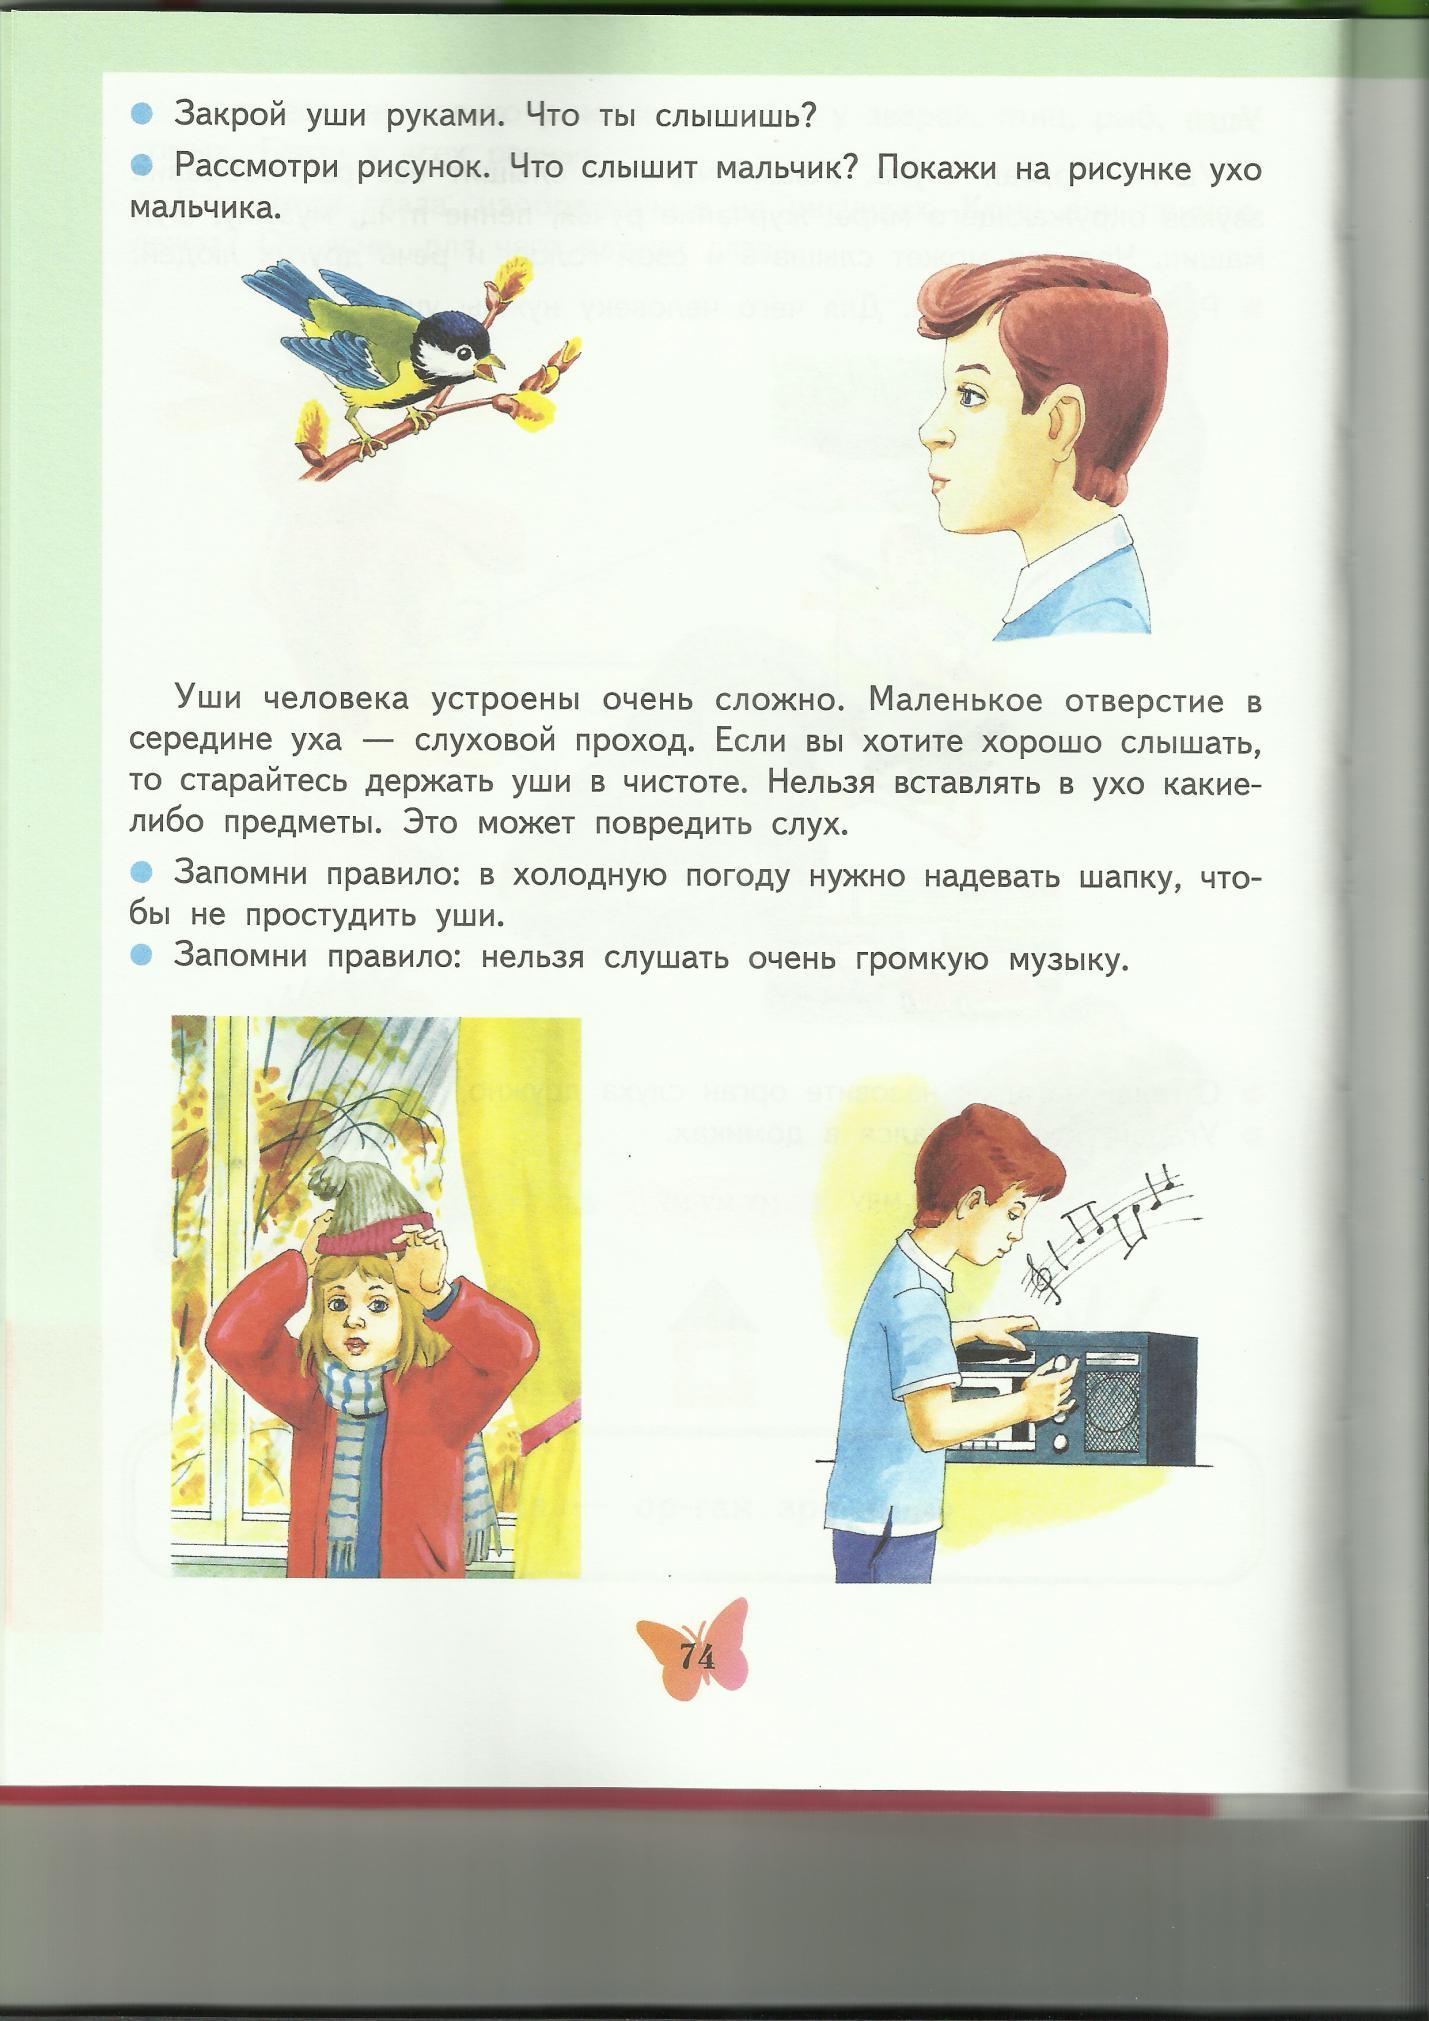 C:\Users\пр\Desktop\ТЕТРАДИ\человек\17.tif